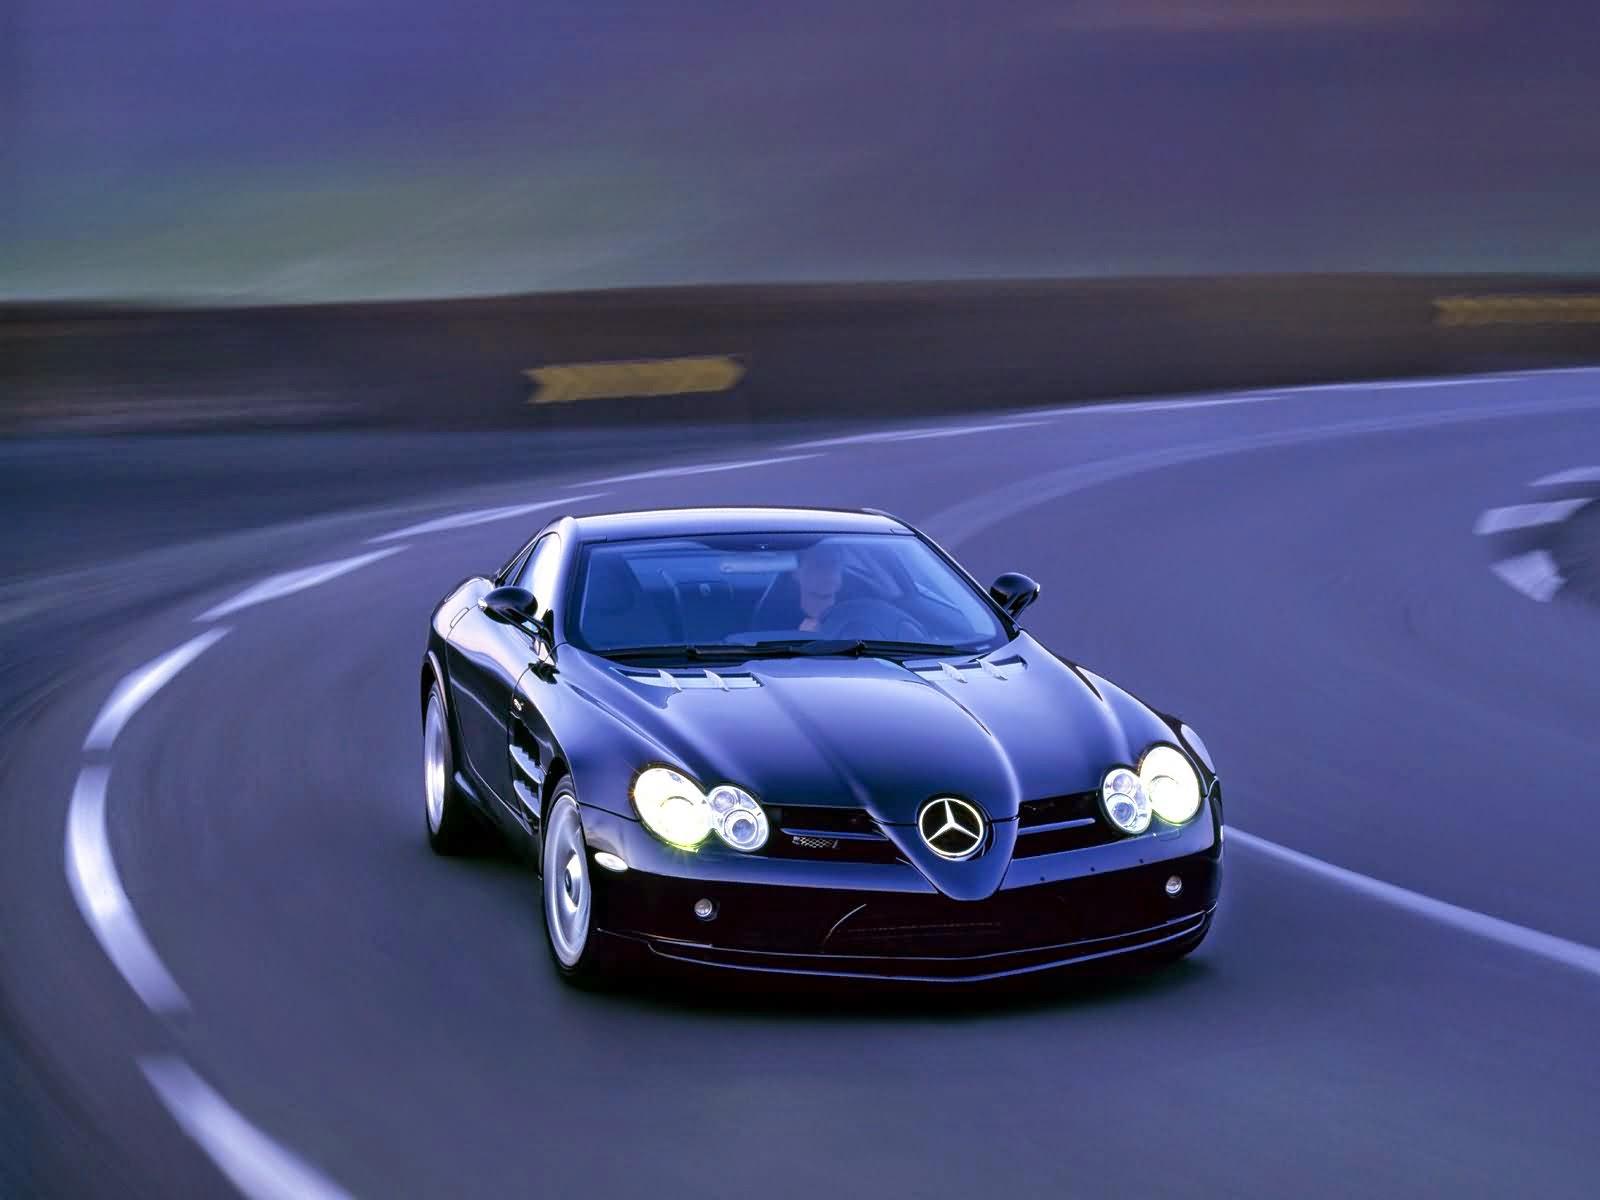 Mercedes Benz Slr Sports Car